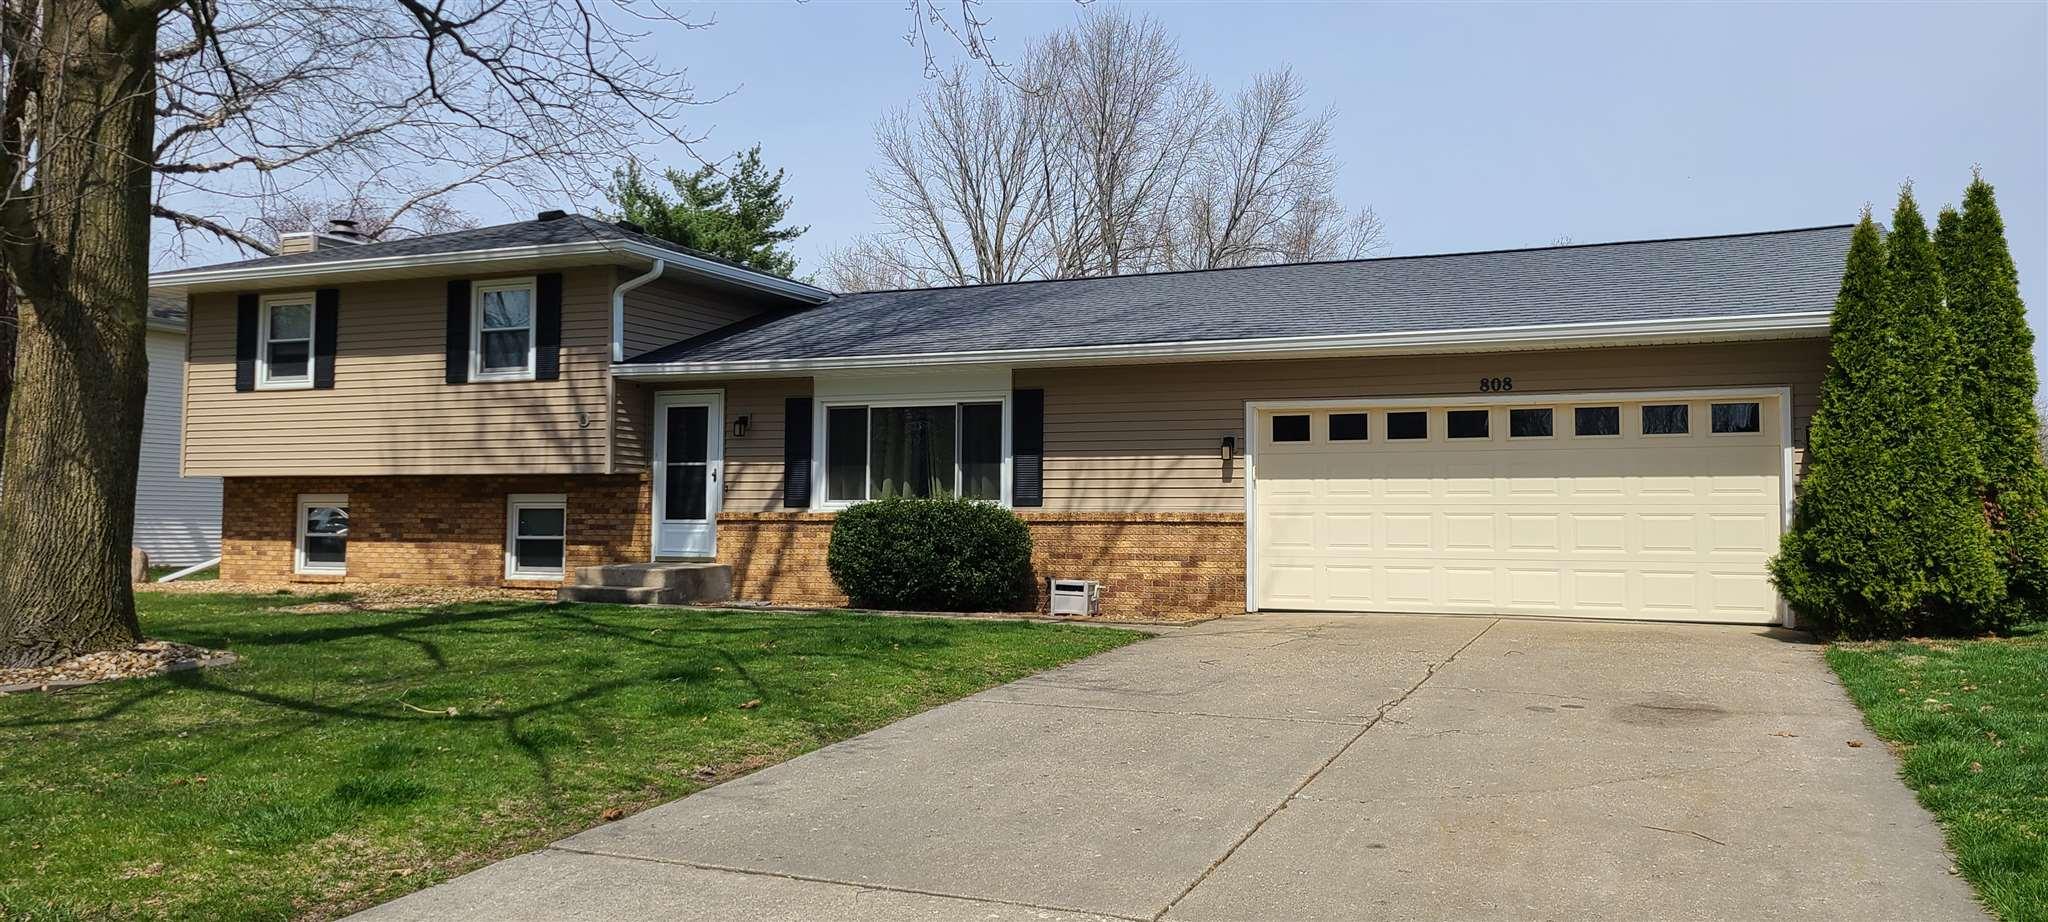 808 Flaggland Property Photo - Sherman, IL real estate listing